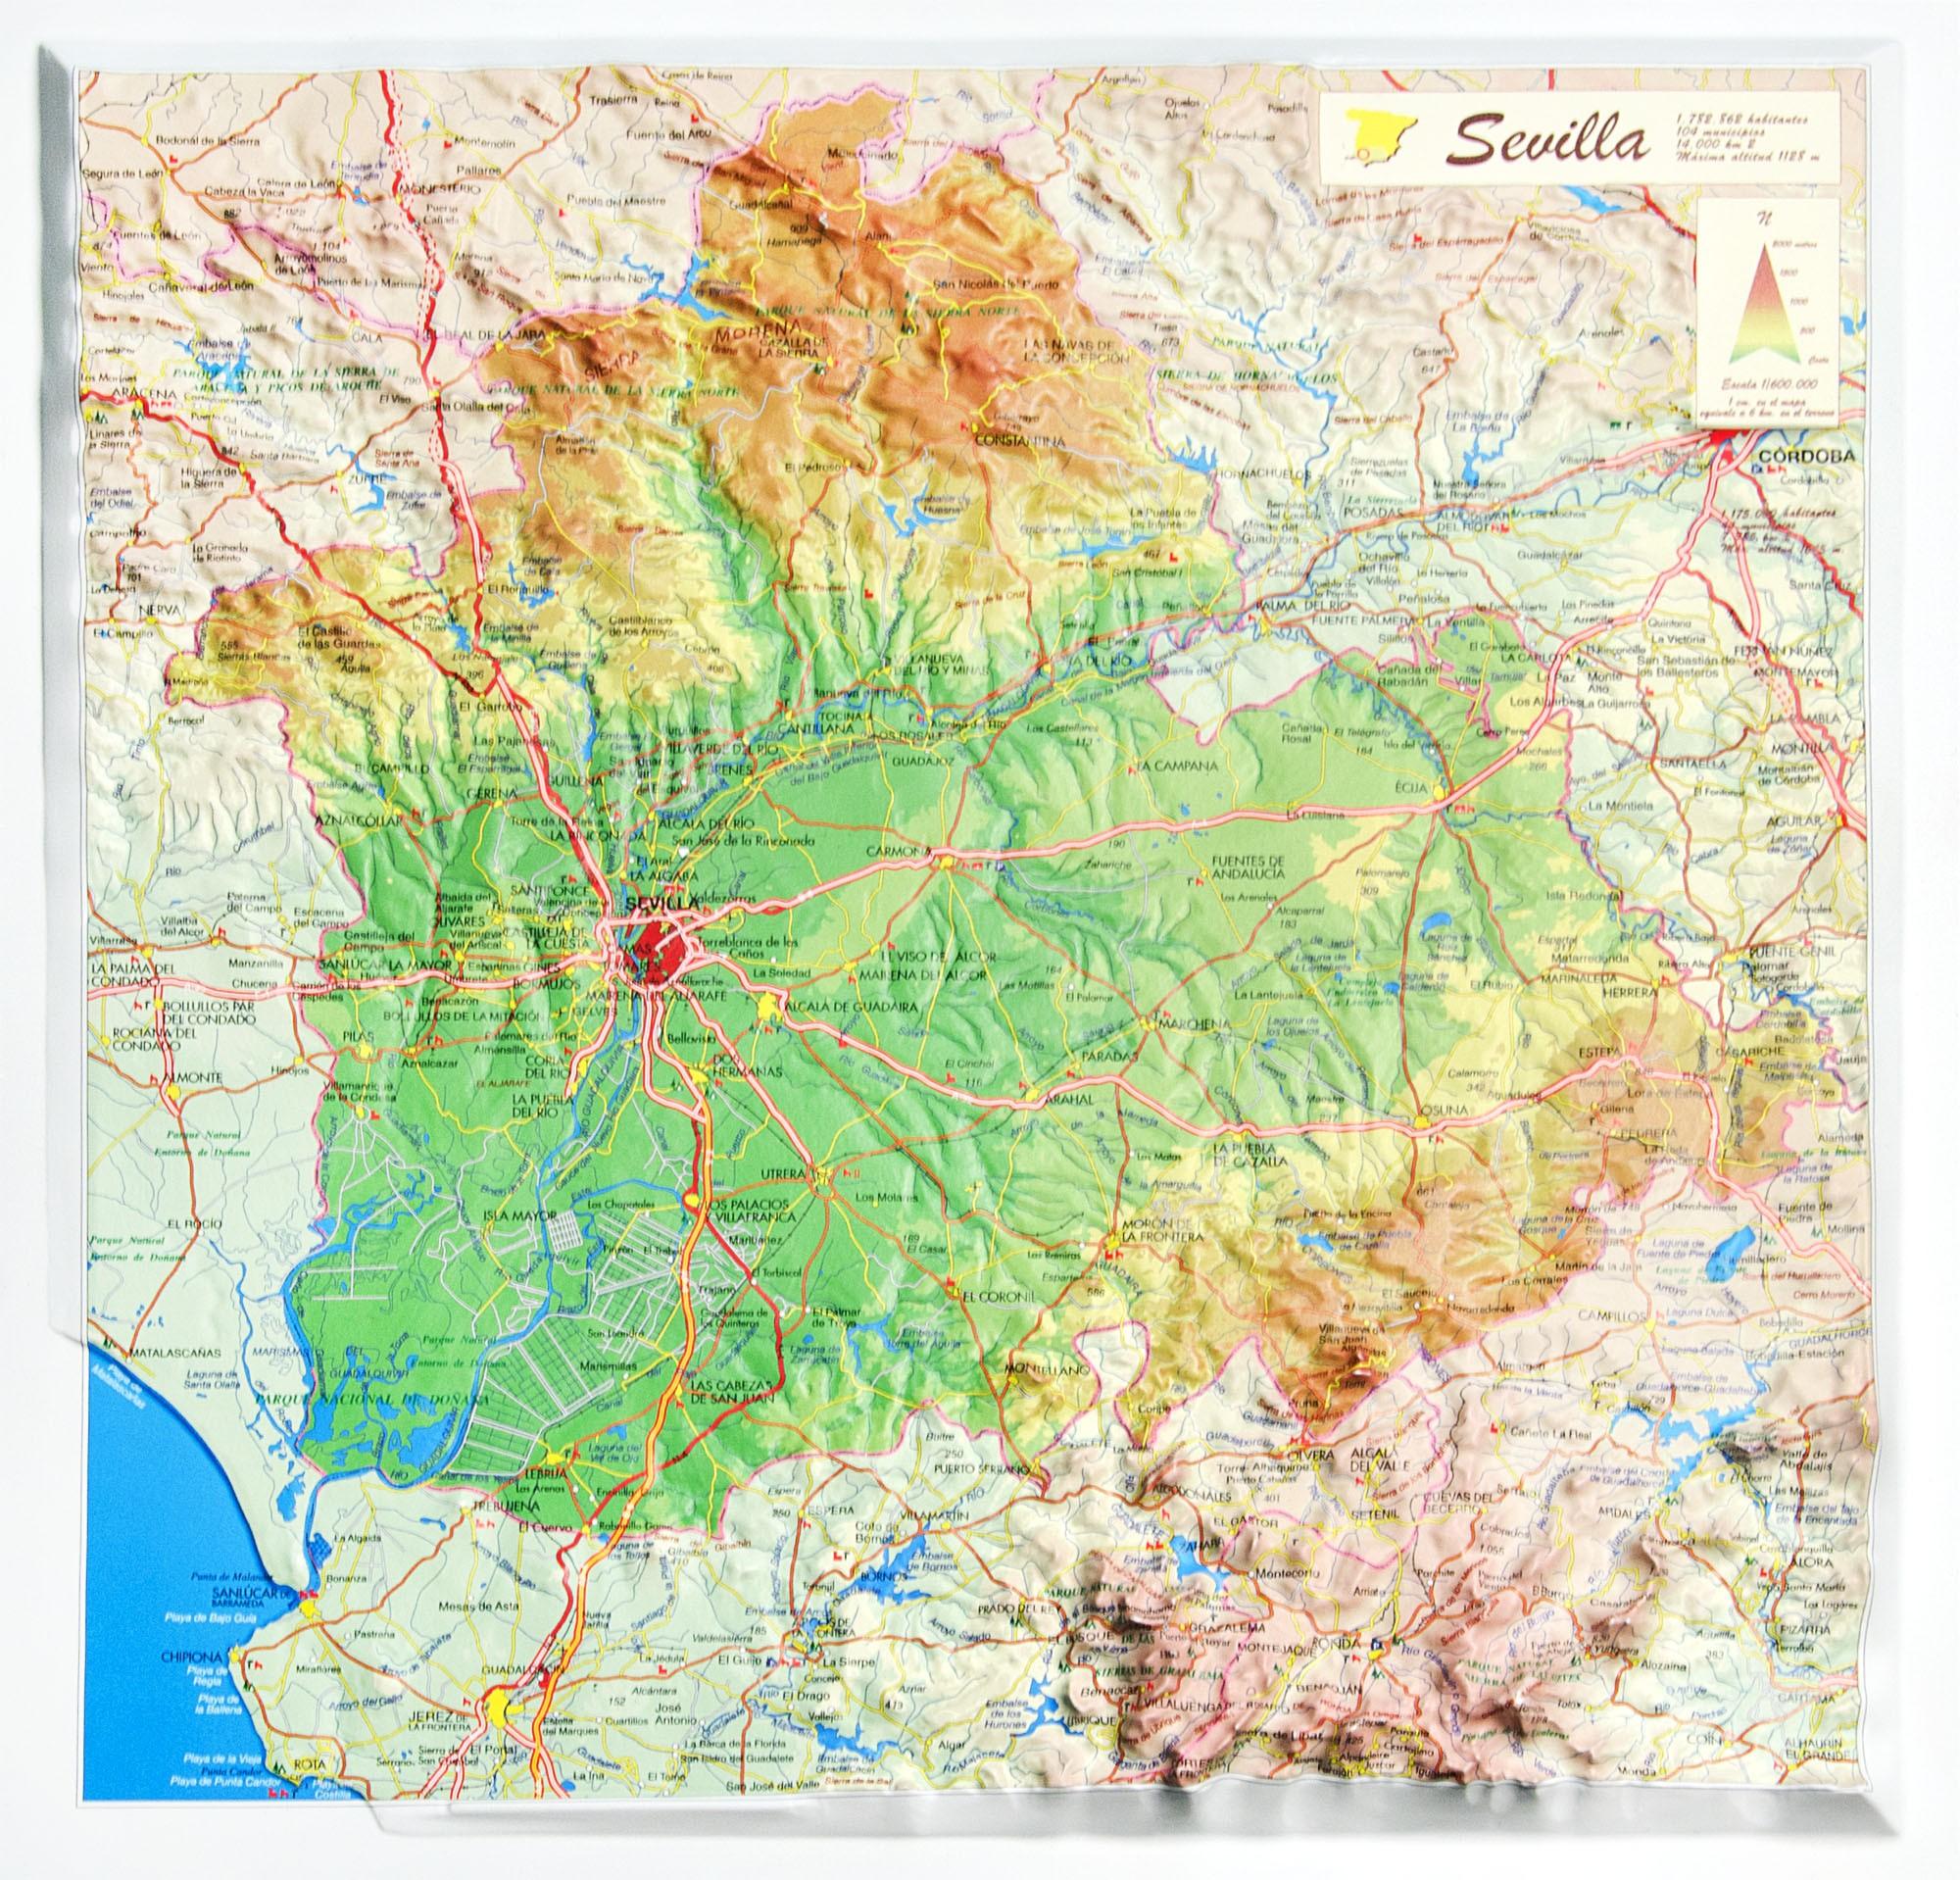 Mapa Provincia De Sevilla Para Imprimir.Provincia De Sevilla En Relieve